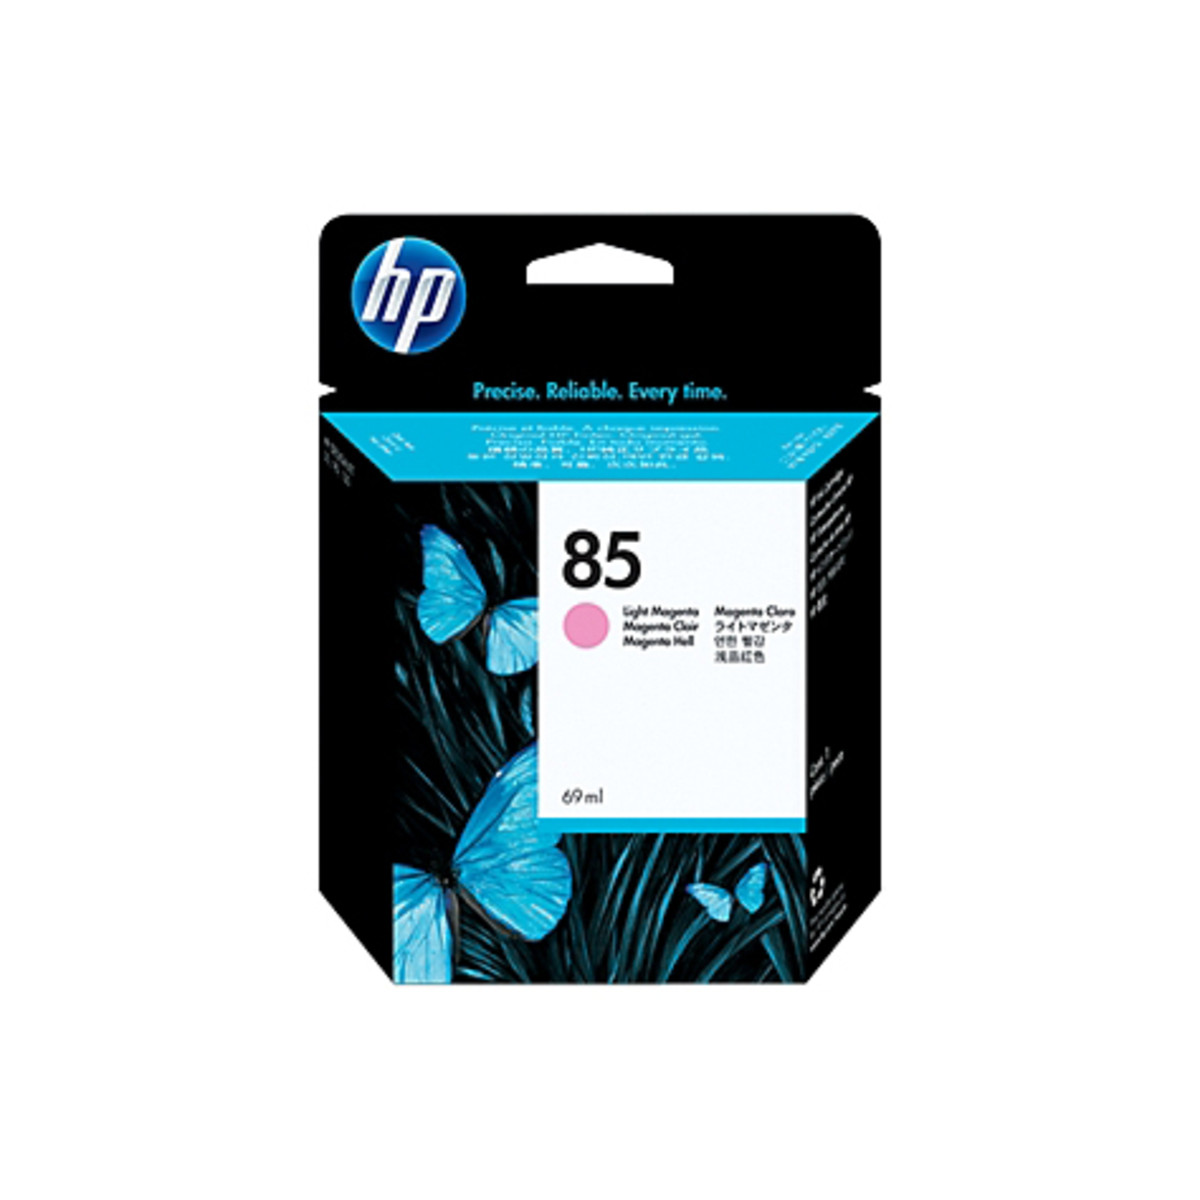 HP 85 (C9429A) Light Magenta Ink Cartridge